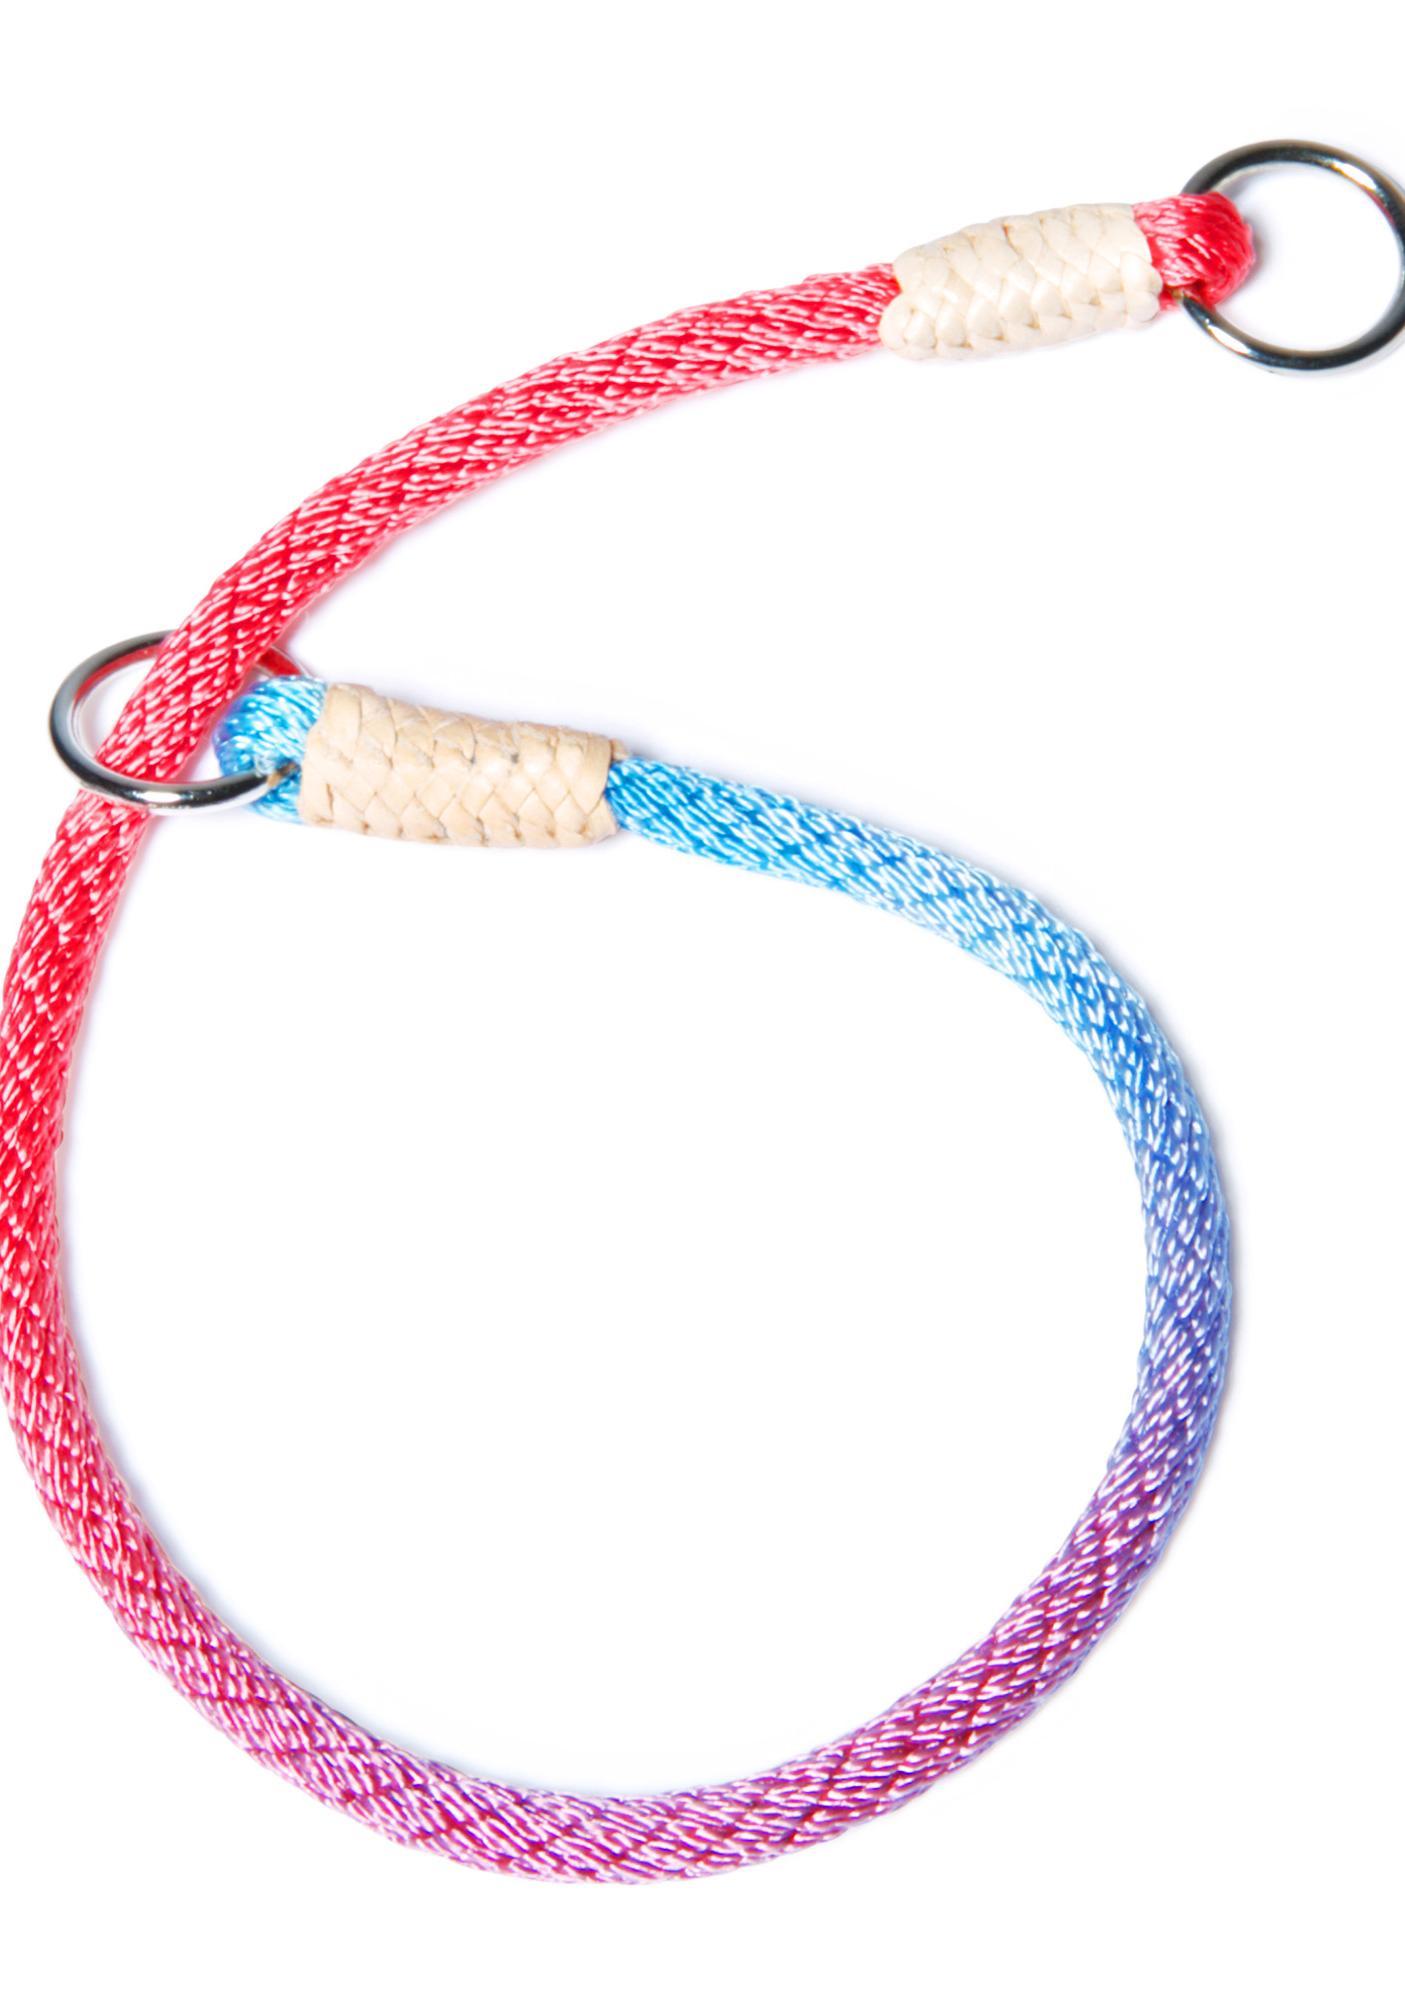 Chasing Rainbows Slip Collar